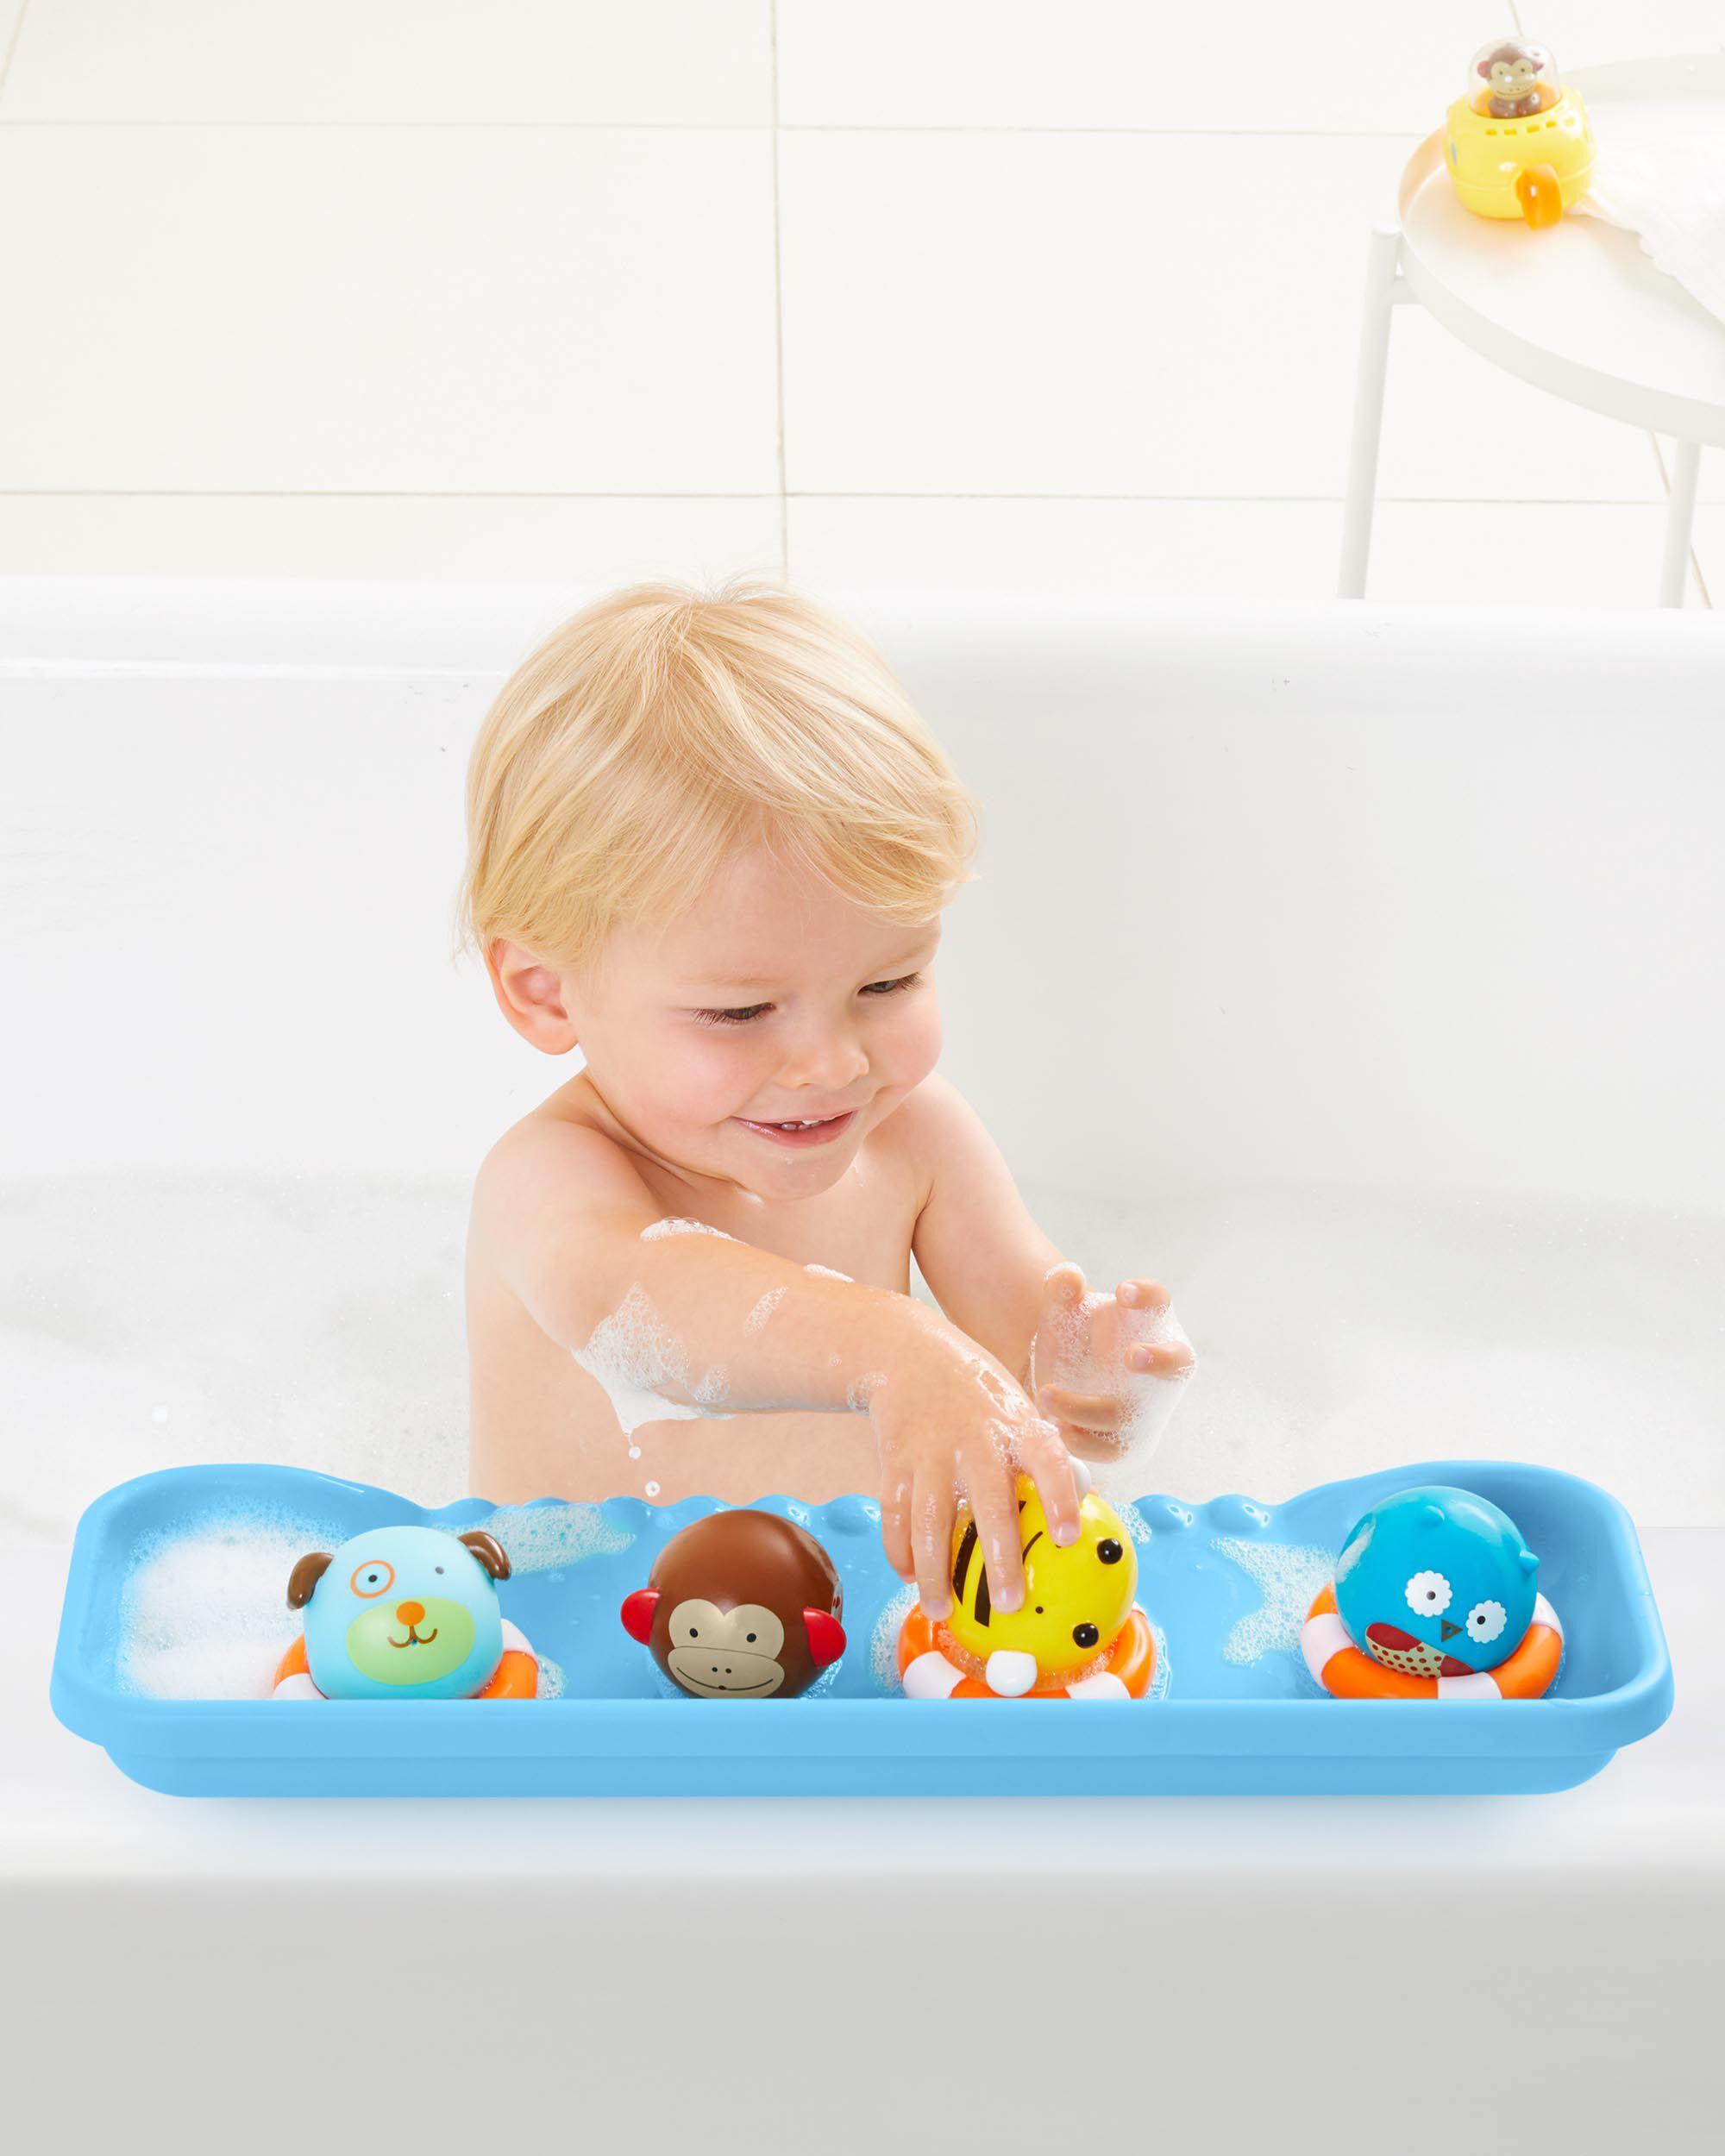 Moby Shelfie™ Bathtub Play Tray   Skiphop.com